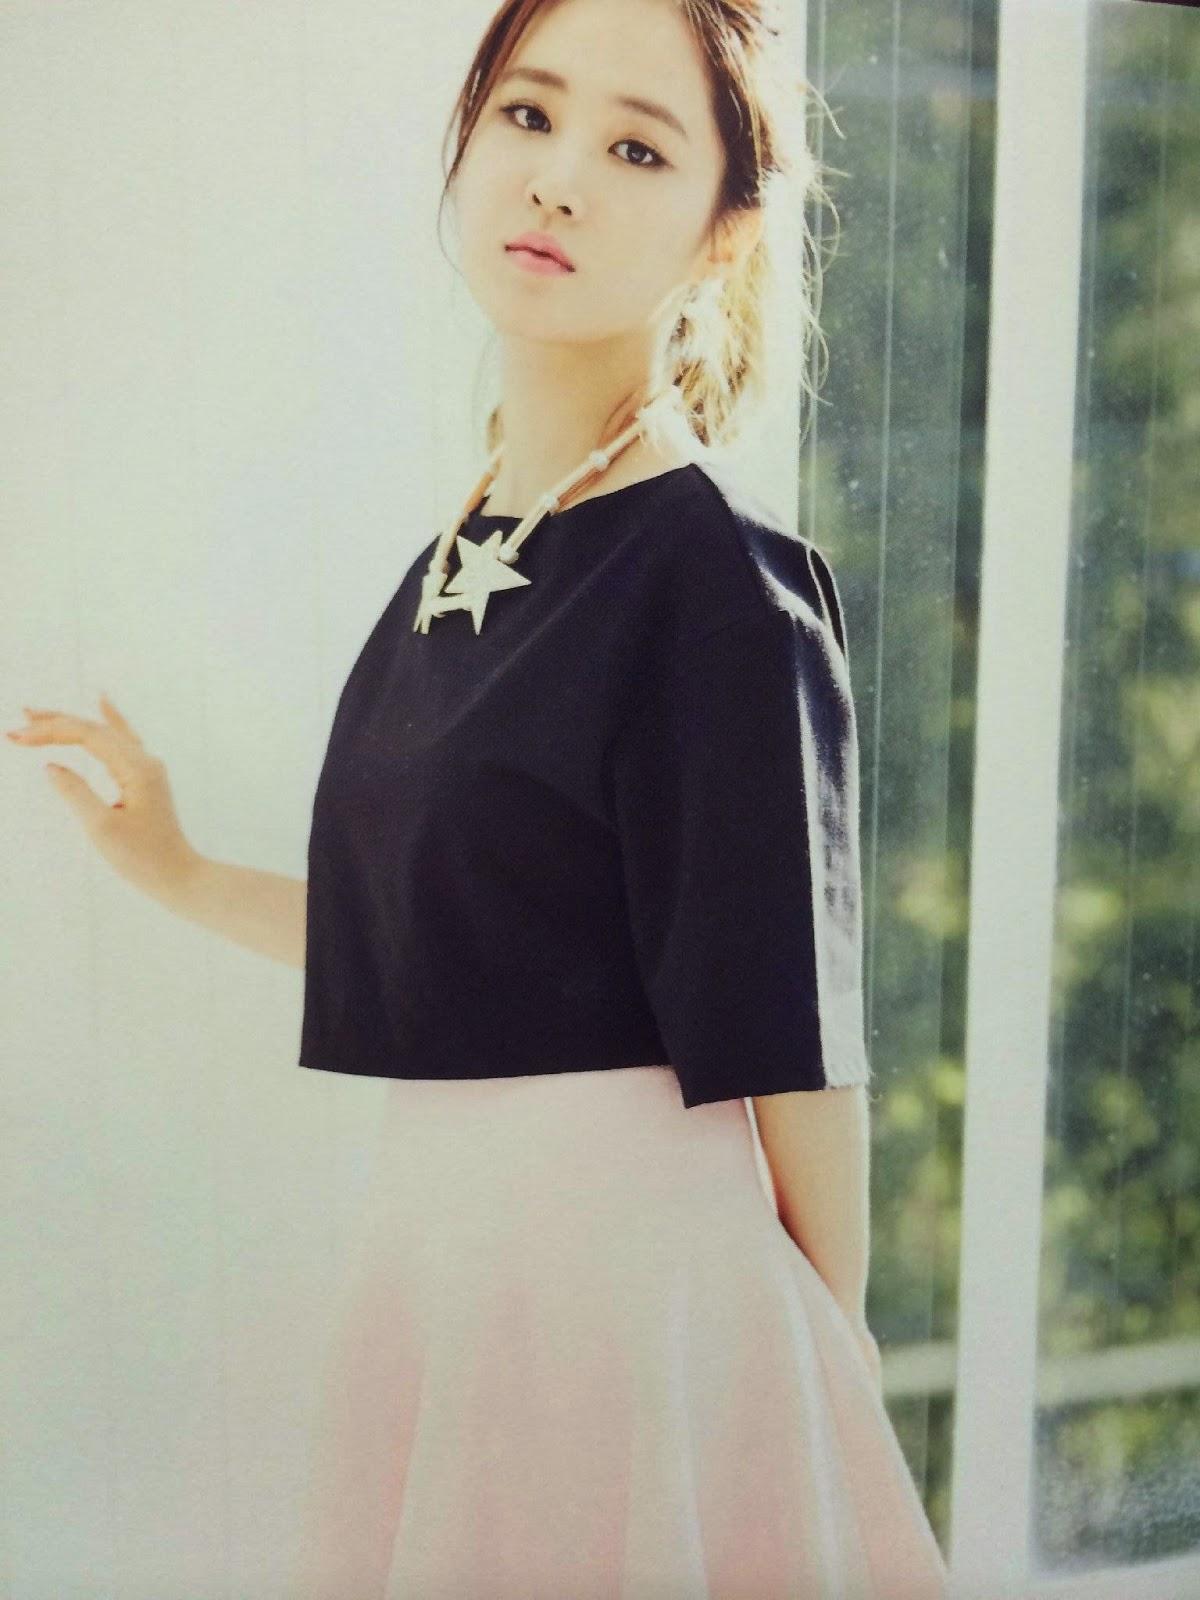 SNSD Yuri (유리; ユリ) Girls Generation The Best Scan Photos 5